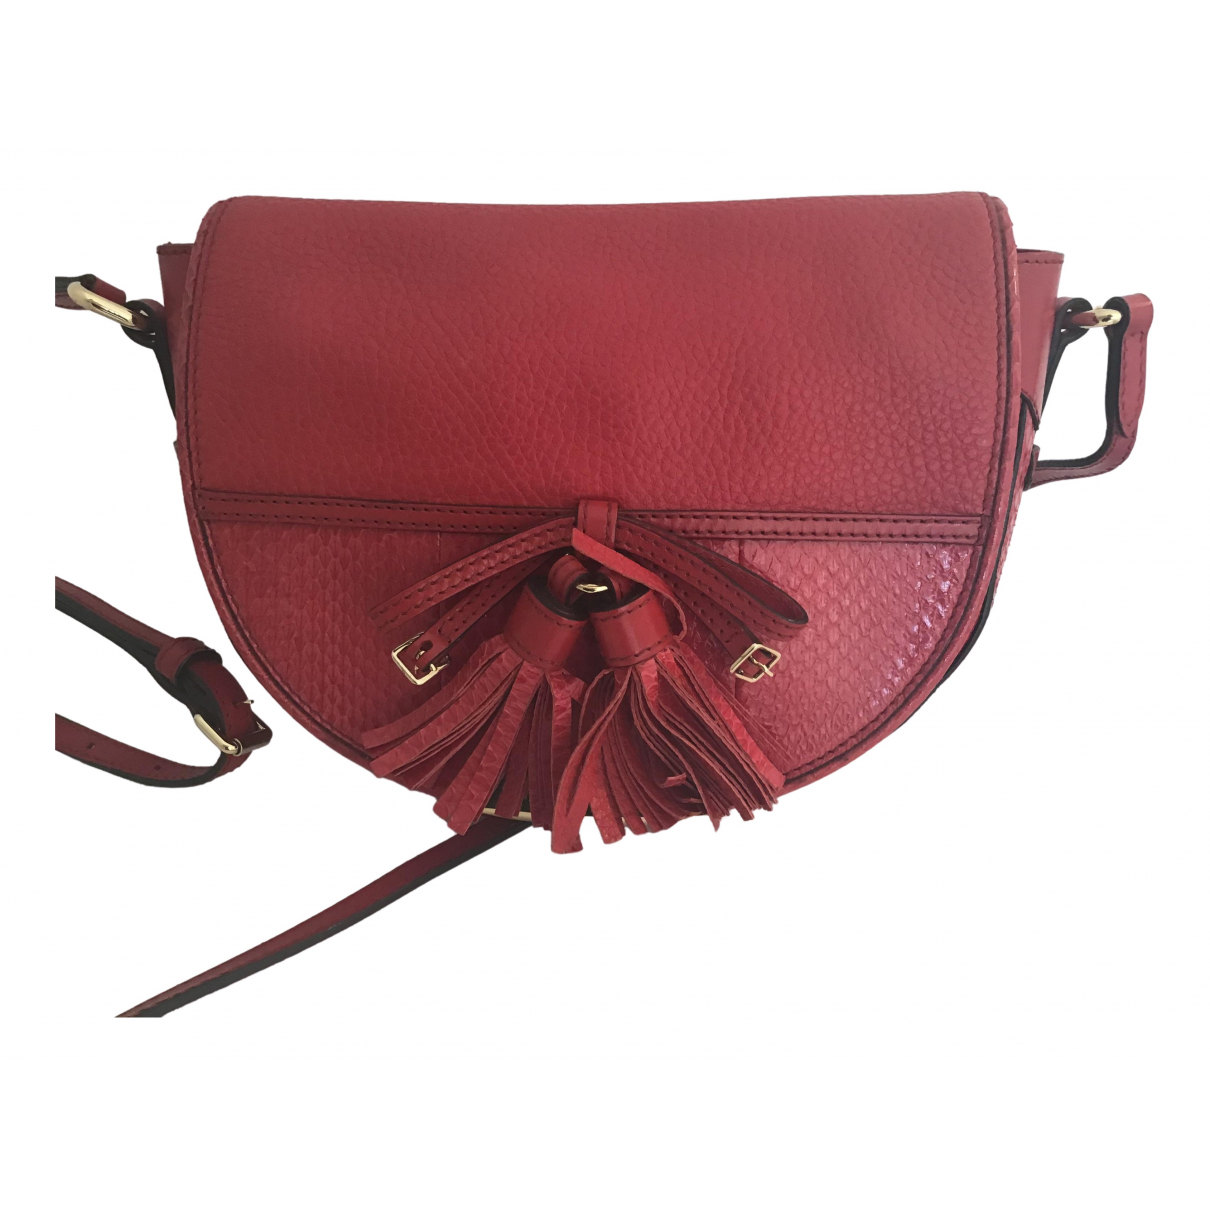 Burberry \N Red Leather handbag for Women \N